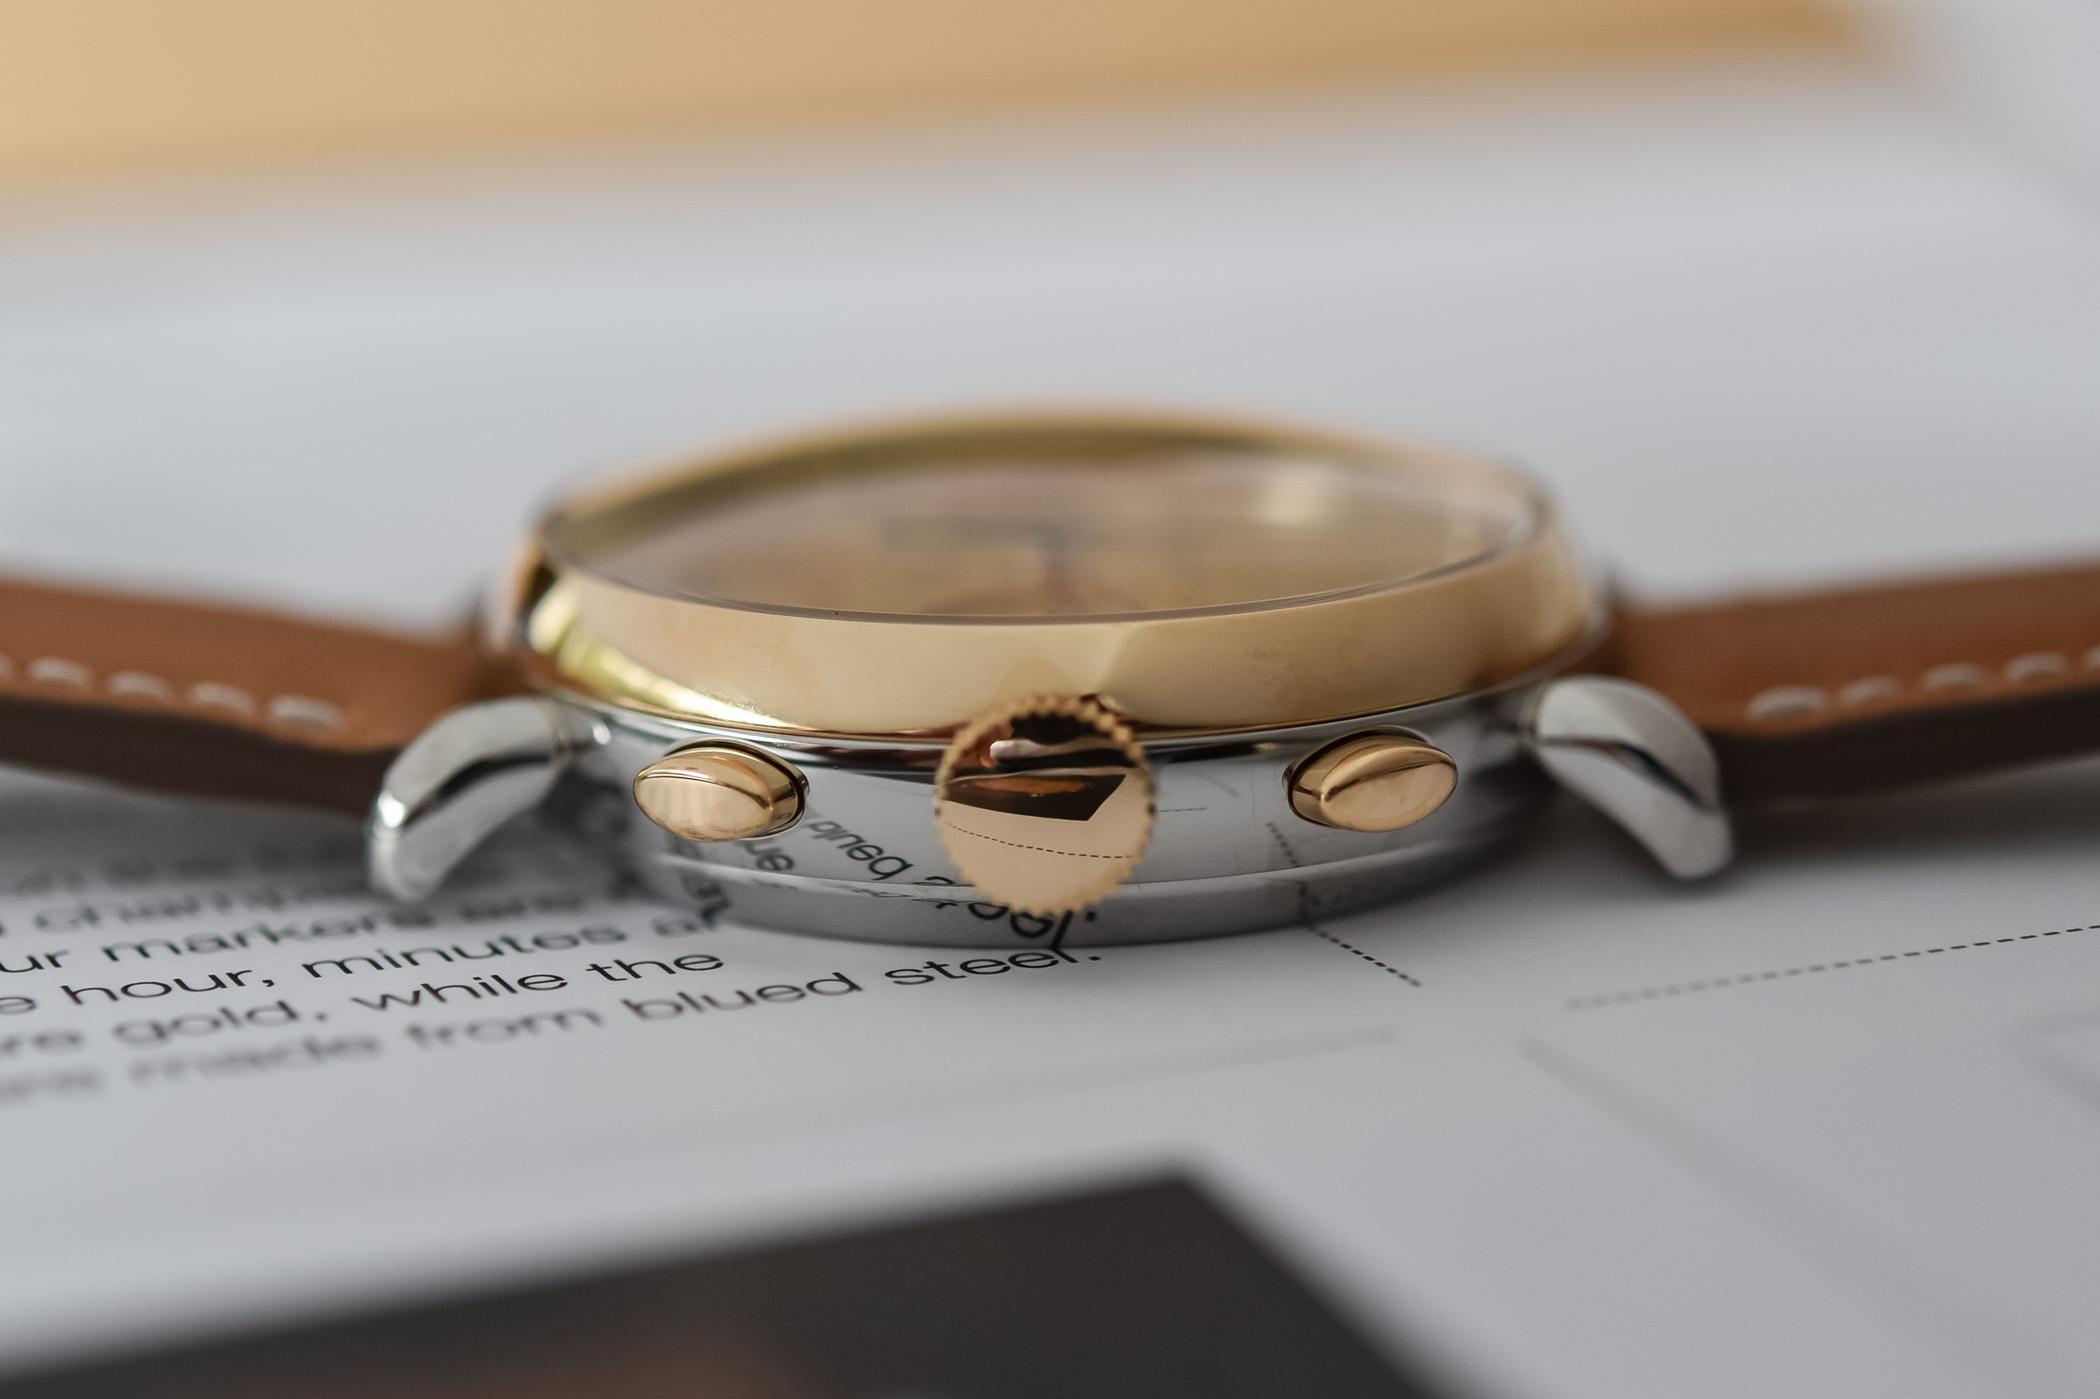 La caja bitono del Audemars Piguet [Re]master01 Selfwinding Chronograph